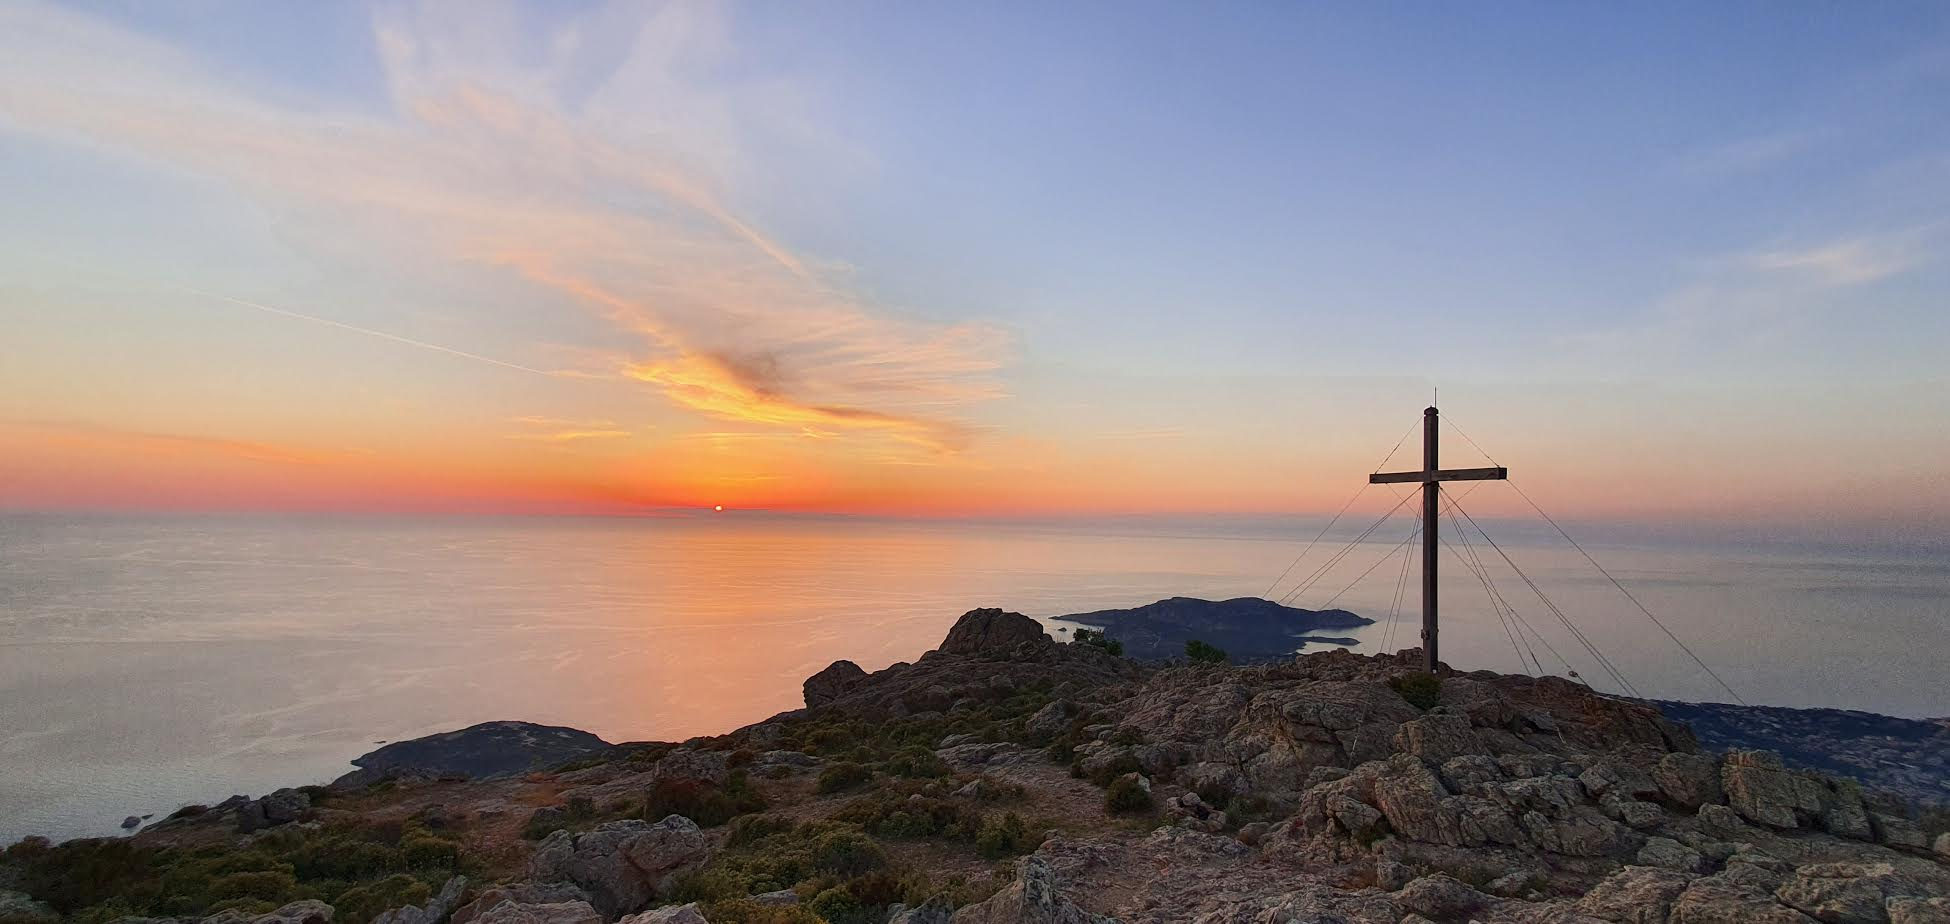 La photo du jour : le coucher de soleil vu du Capu di a Veta